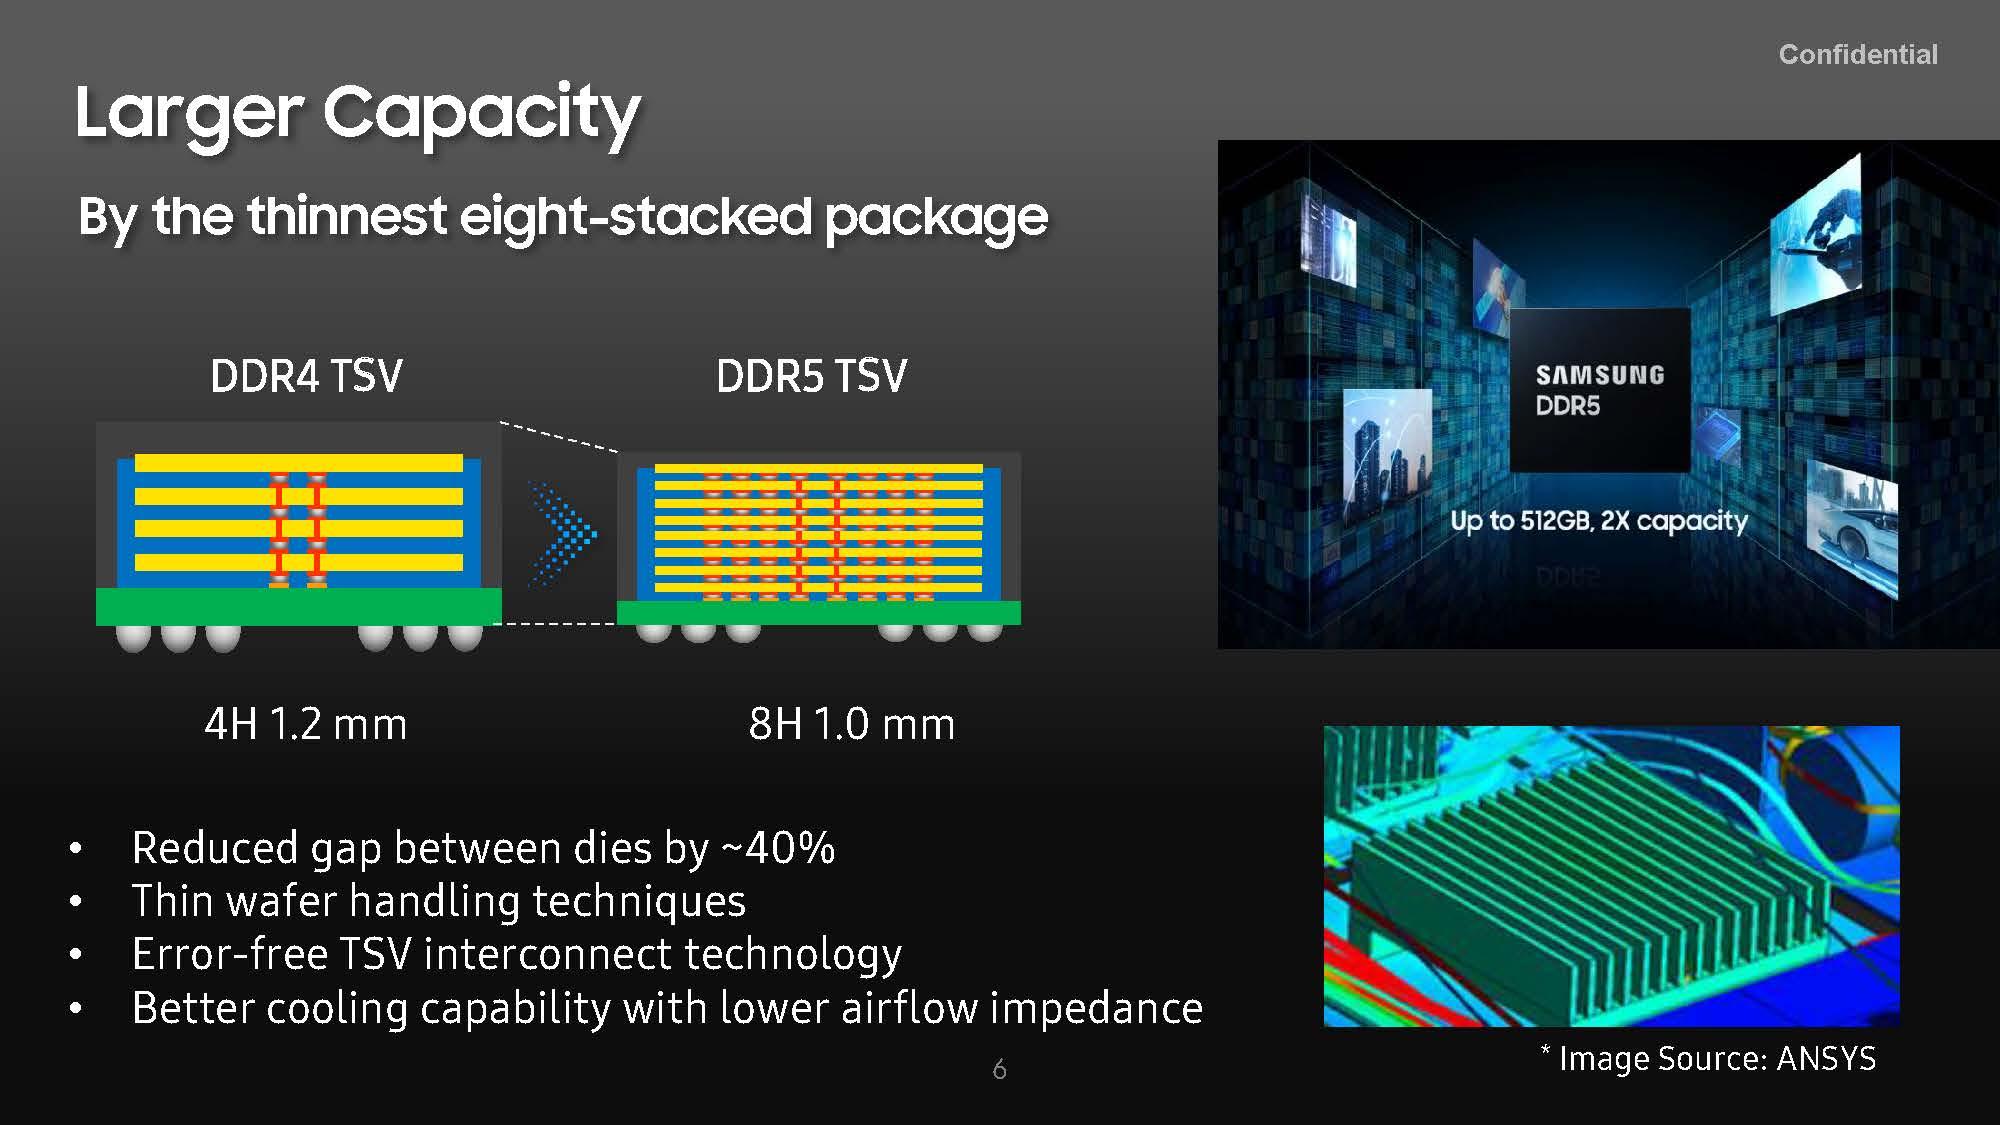 HC33 Samsung DDR5 Larger Capacity